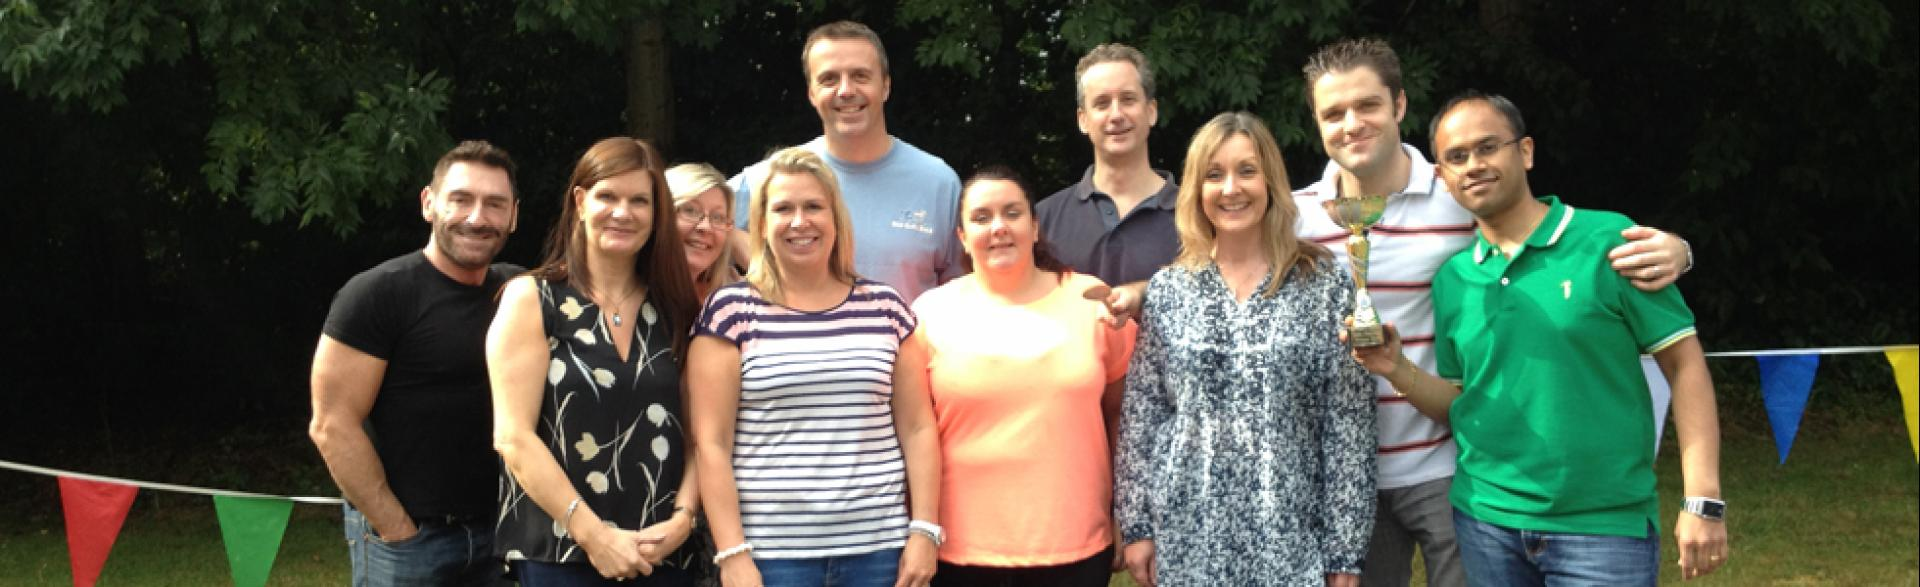 Team Building, London, July 2014